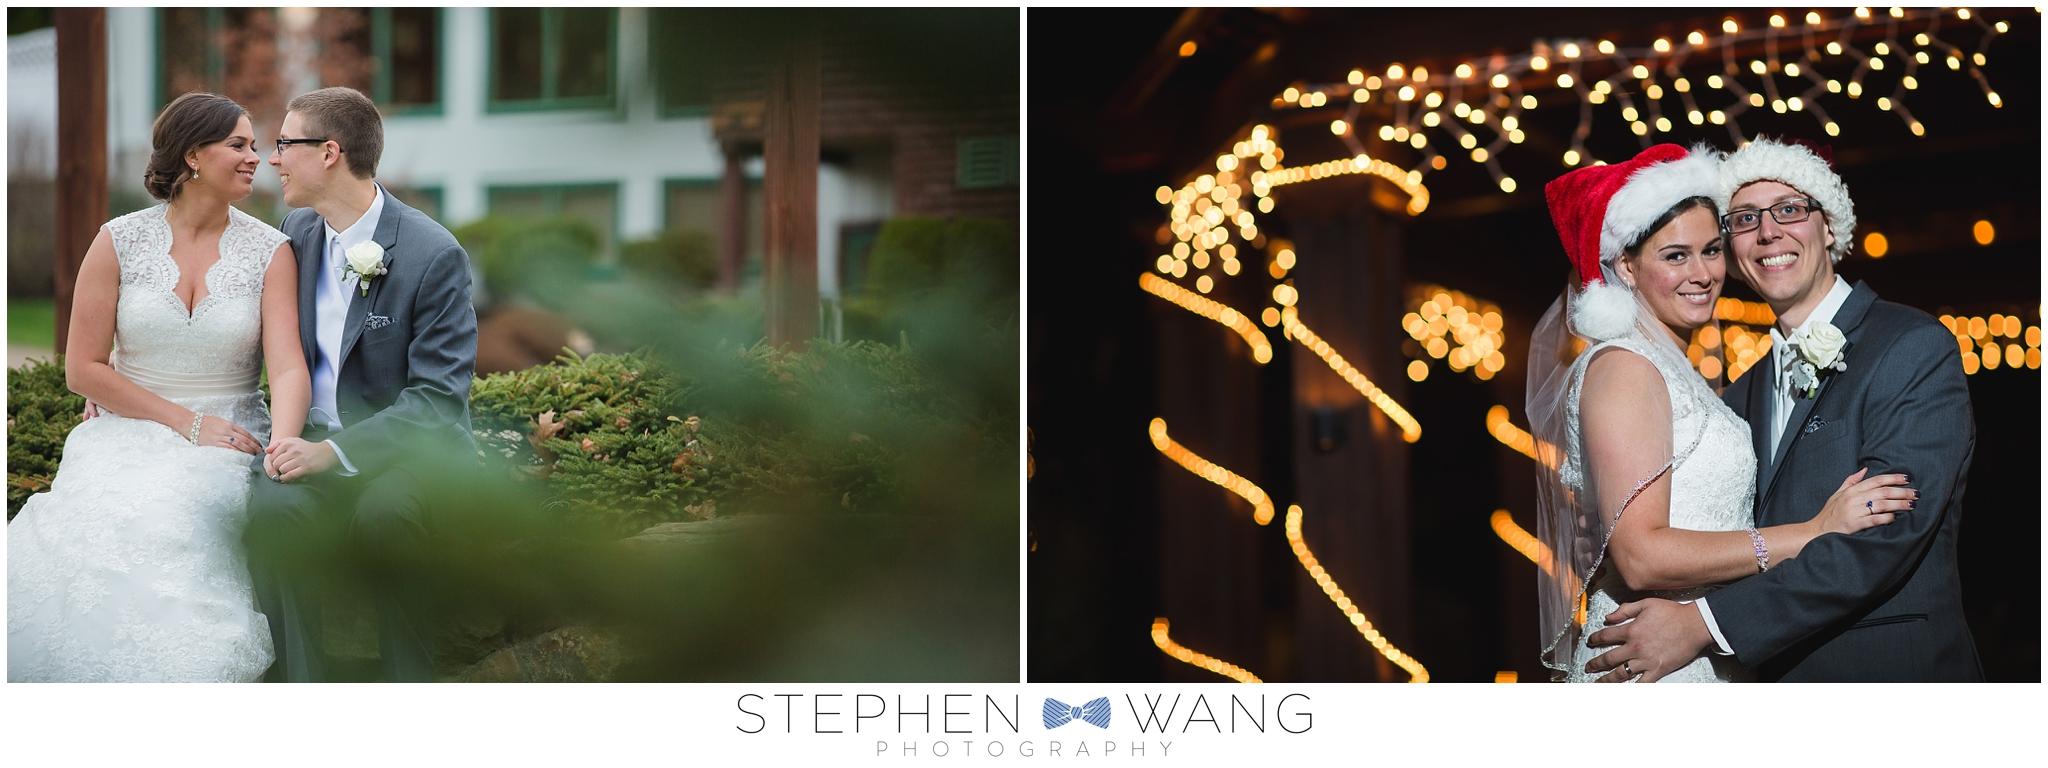 Stephen Wang Photography Wedding Photographer Connecticut CT-12-24_0021.jpg